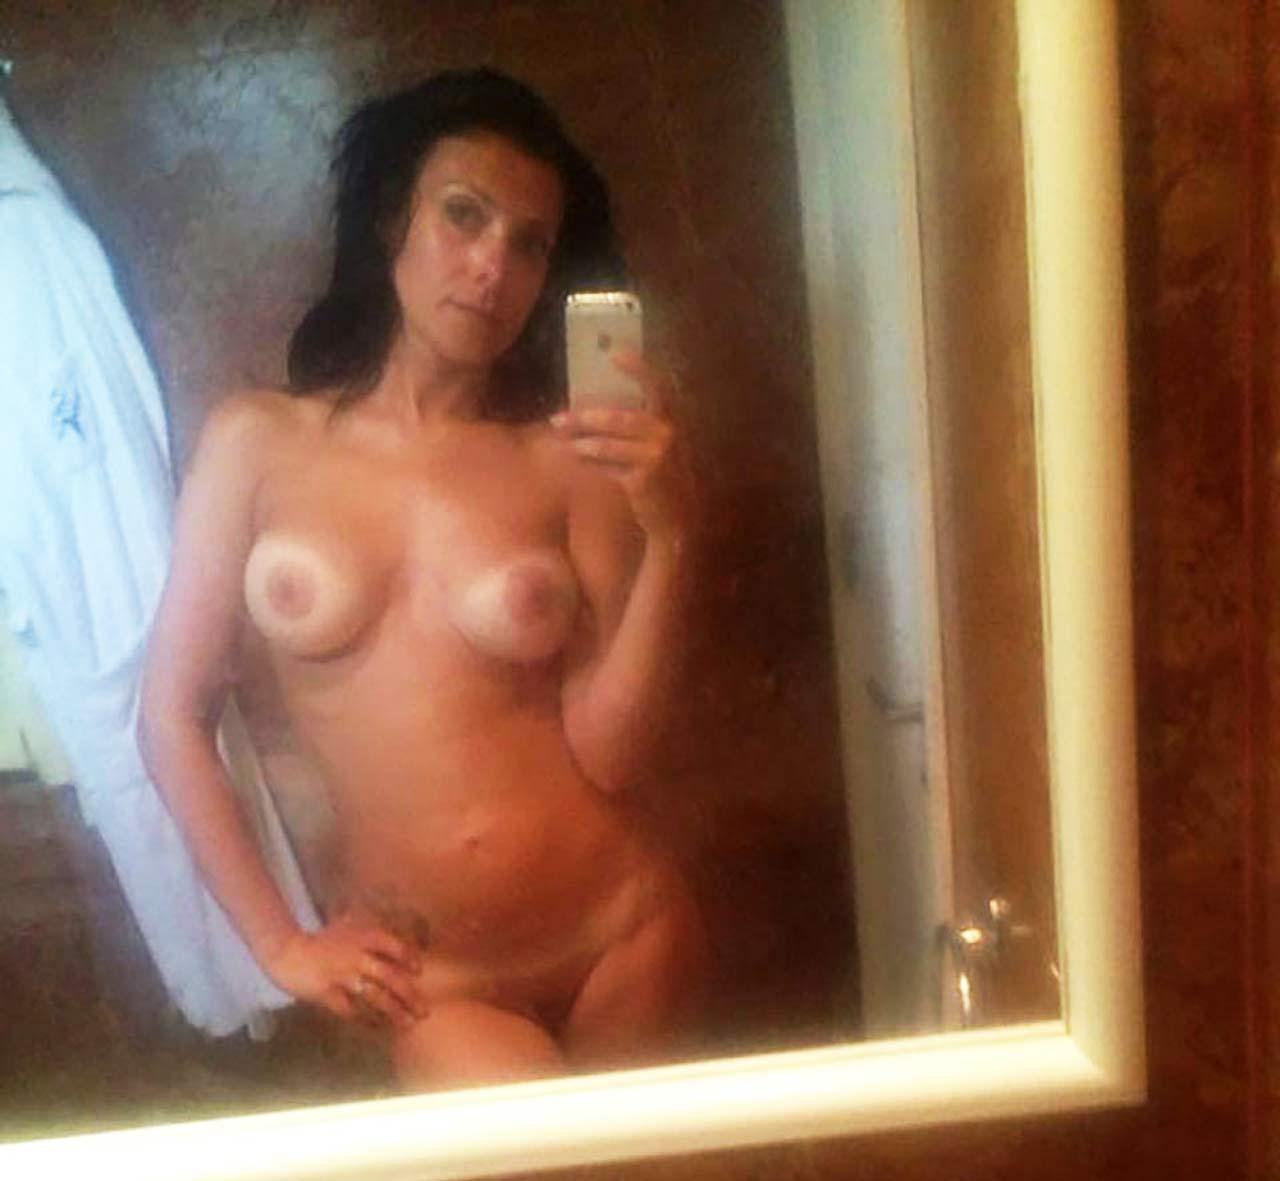 Kym Marsh Nude LEAKED Pics & Blowjob Porn Video 2